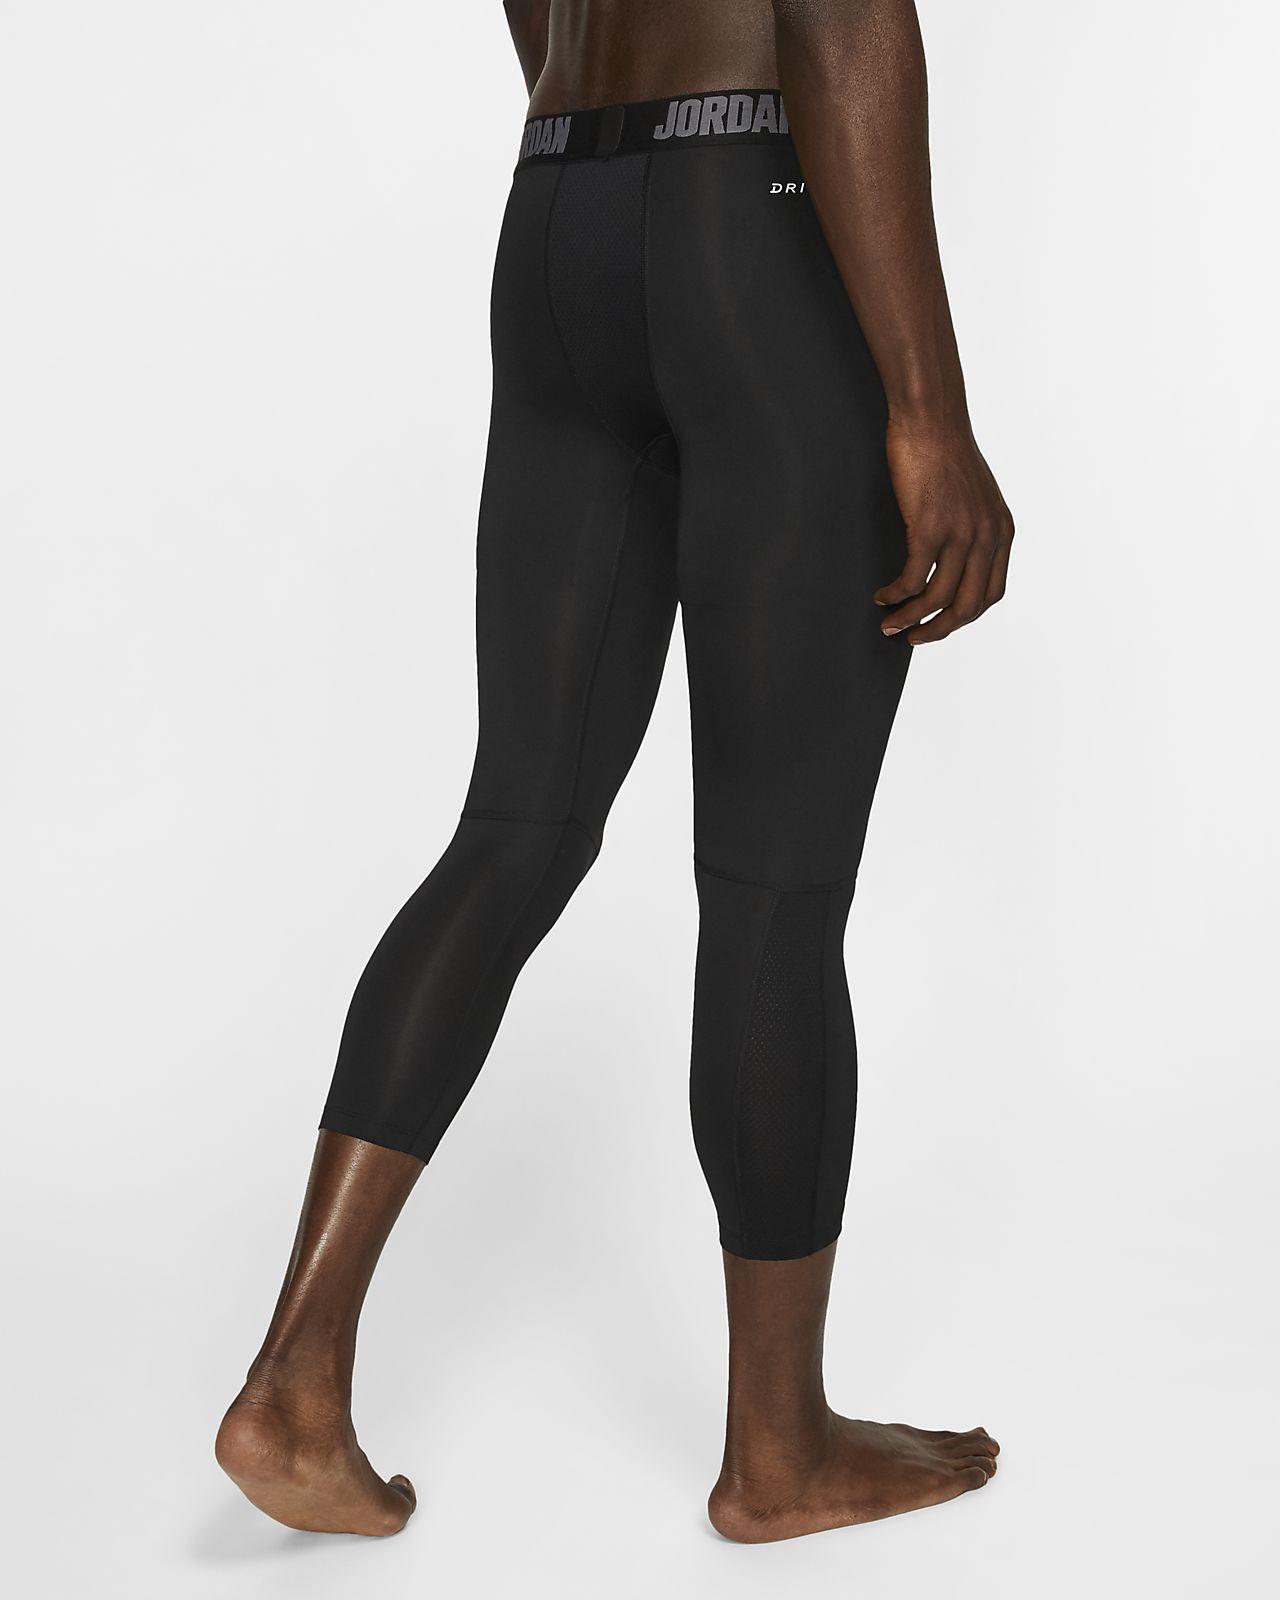 Men/'s Nike Dry Dri-Fit Jordan 3//4 Length COMPRESSION TIGHT FIT Pants SIze S